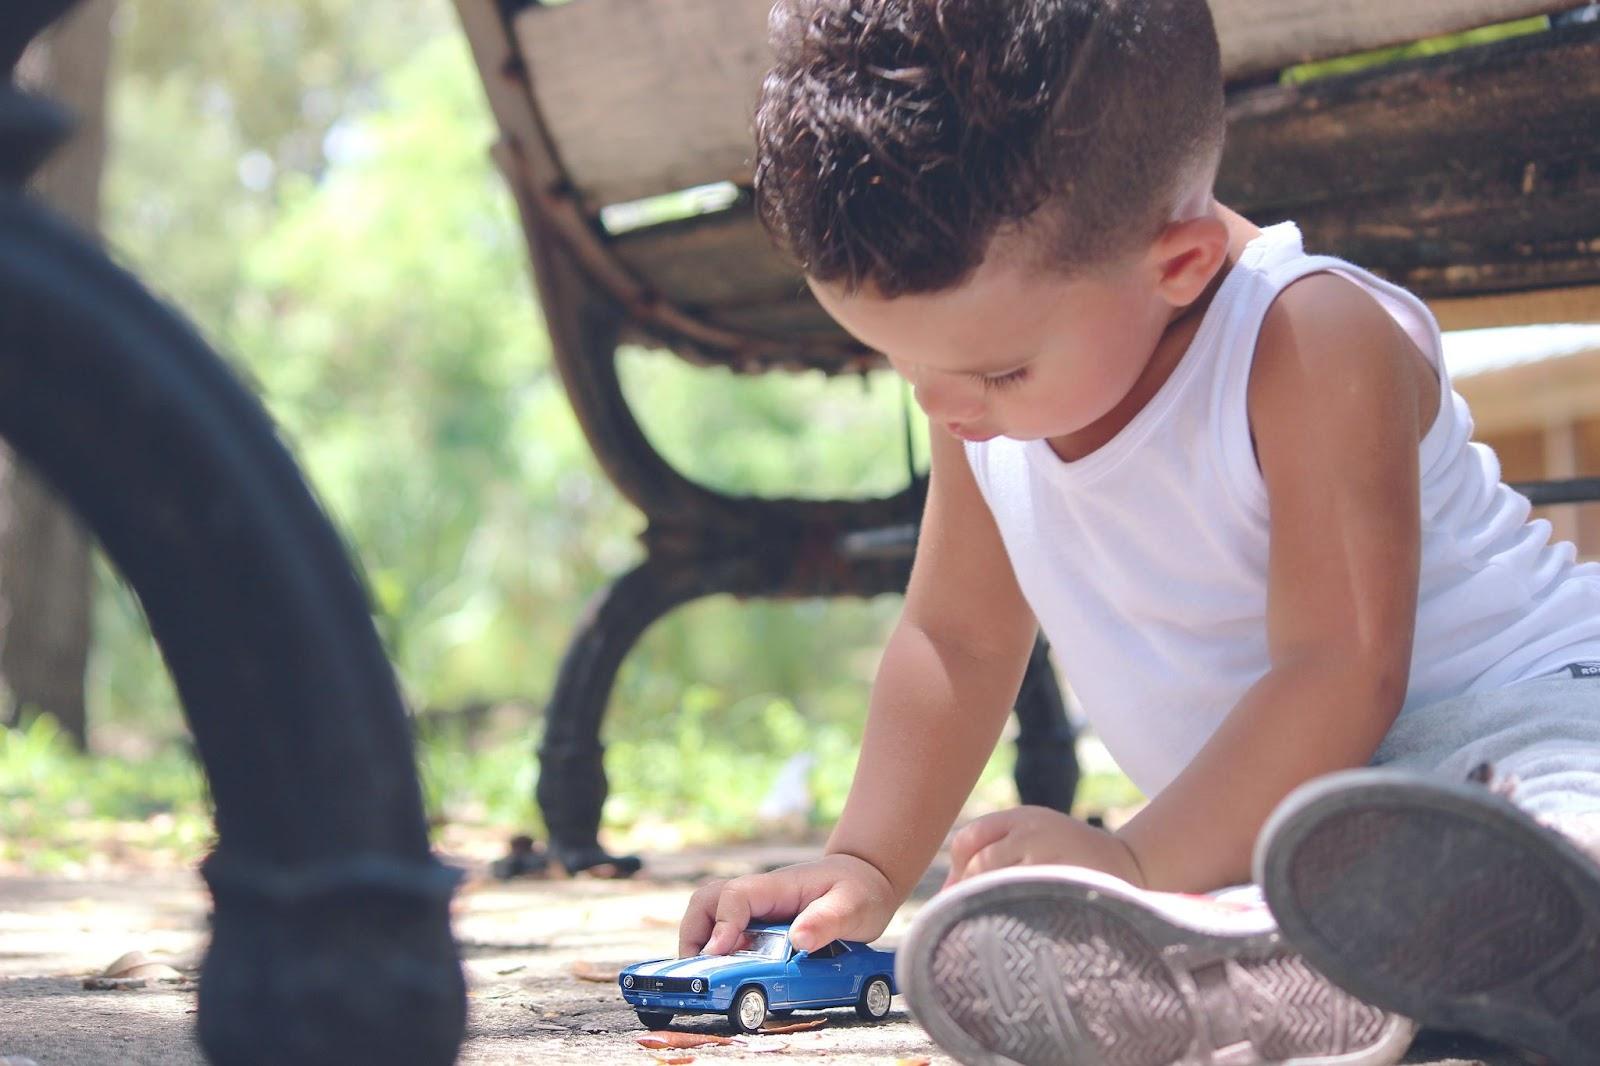 car-toy-childhood-child-163768